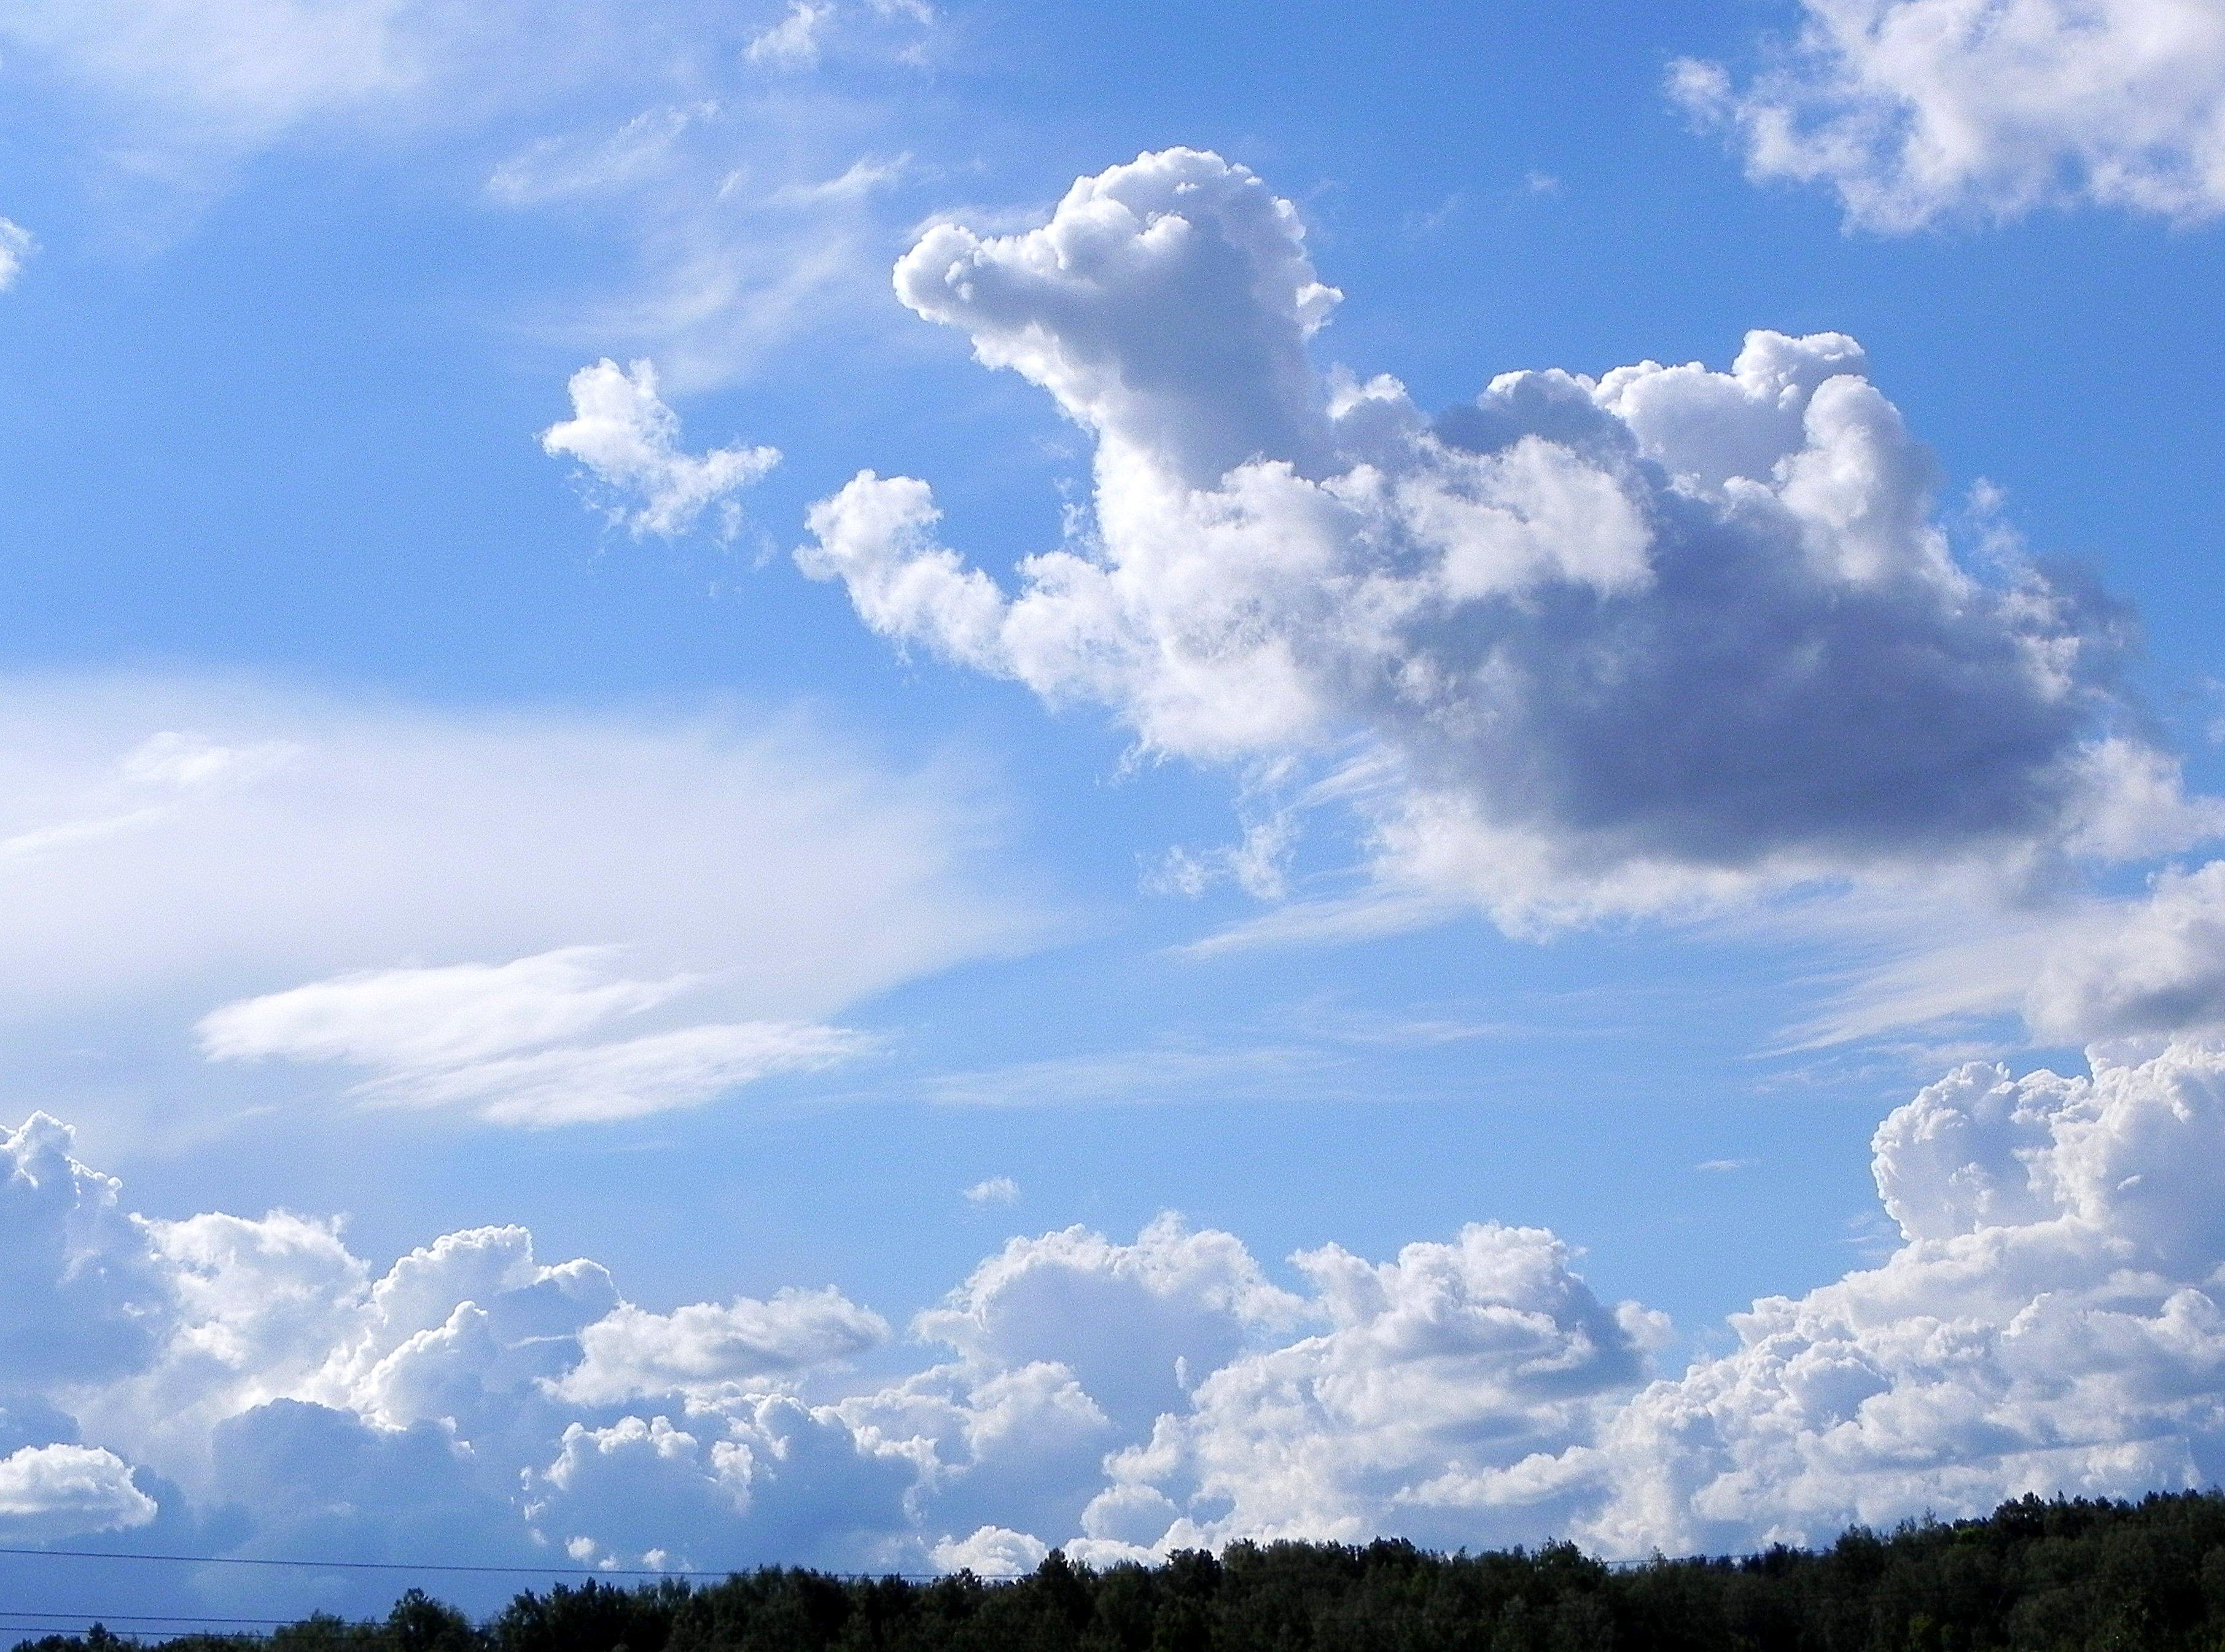 Картинка большого формата небо с облаками